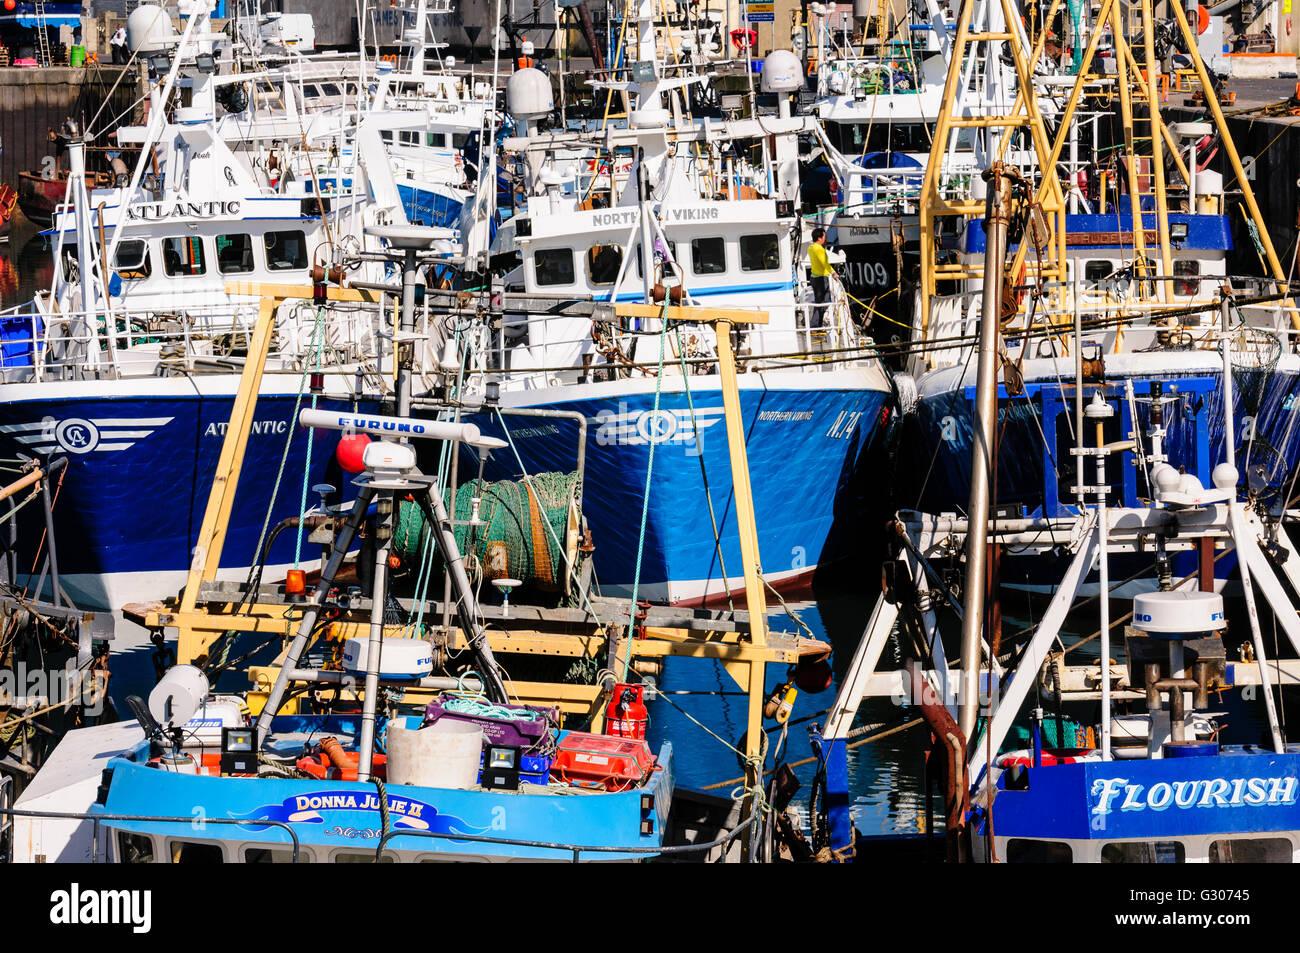 Lots of trawlers moored up in Kilkeel Harbour, Northern Ireland. - Stock Image